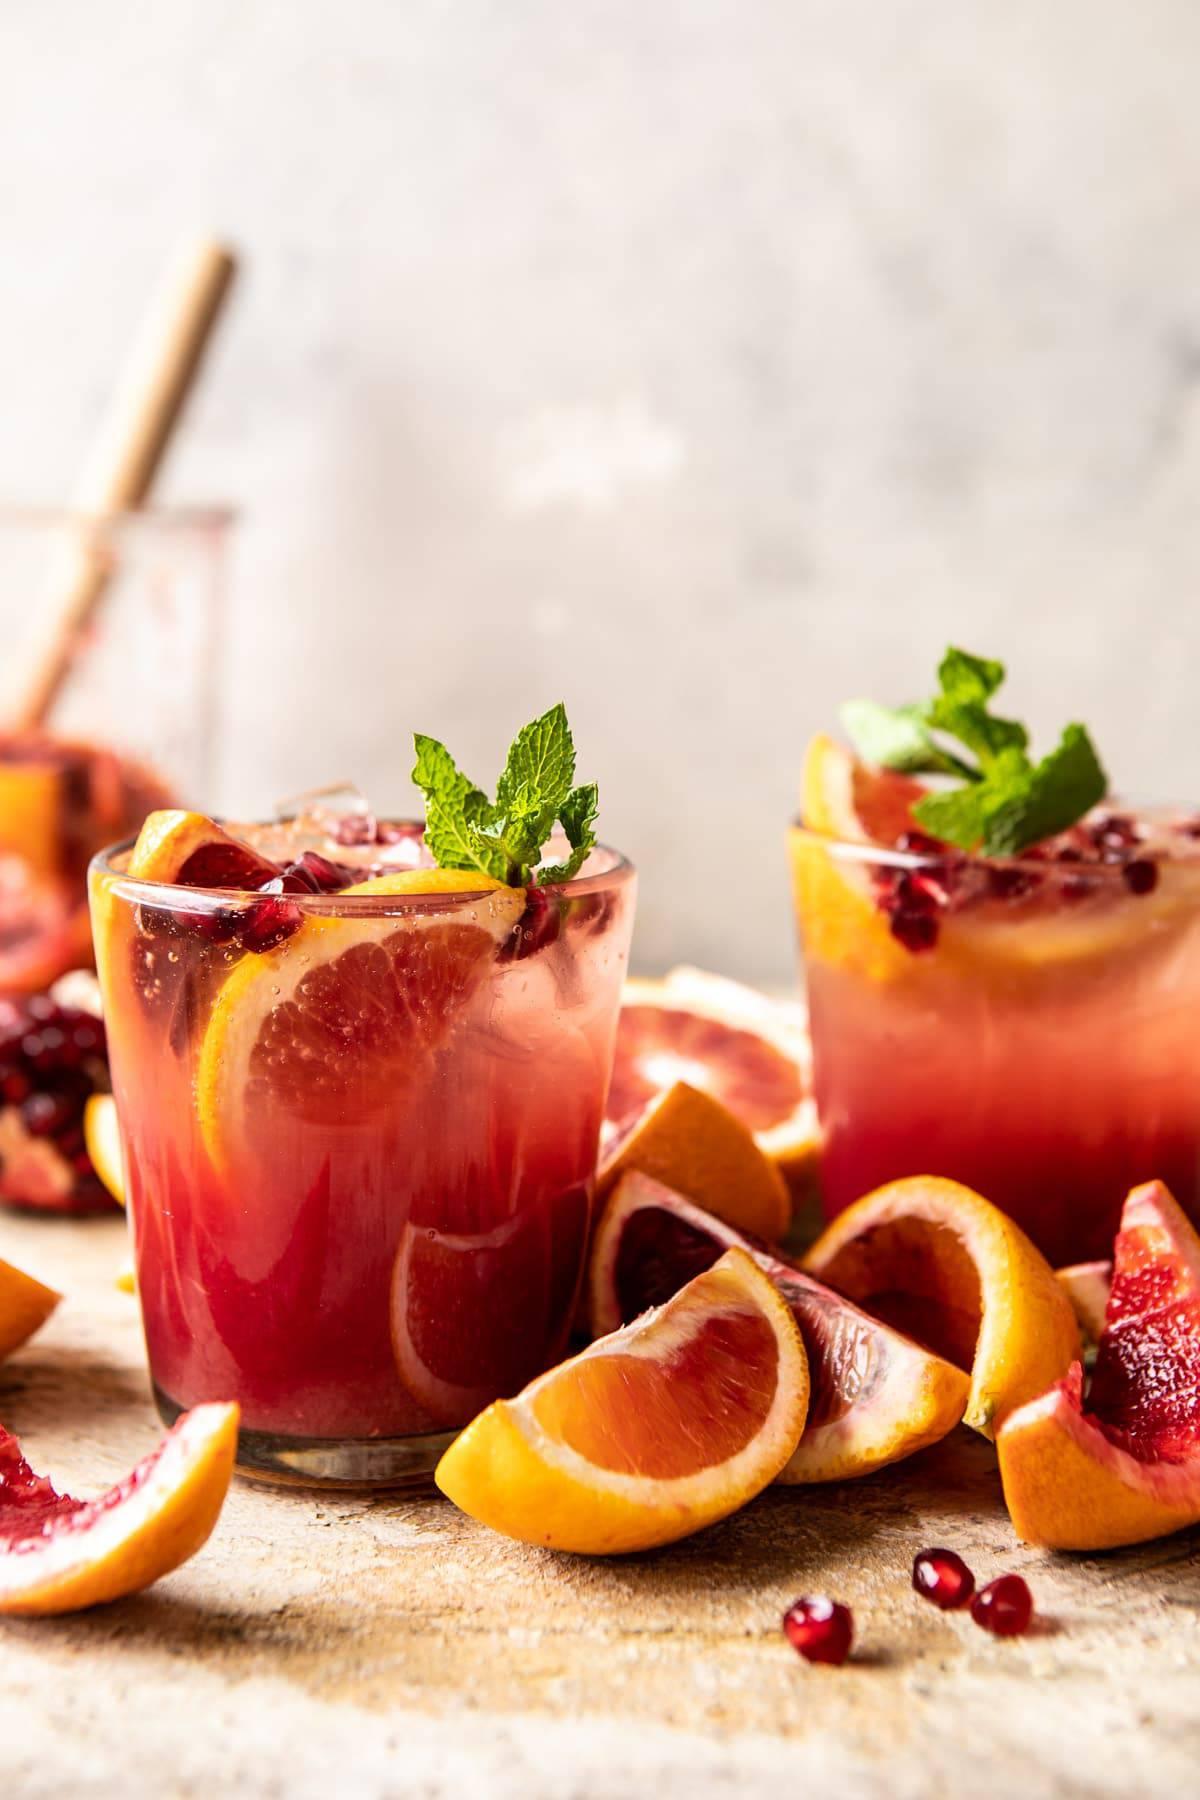 Winter Citrus Tequila Smash   halfbakedharvest.com #citrus #cocktail #healthyrecipes #drinkrecipes